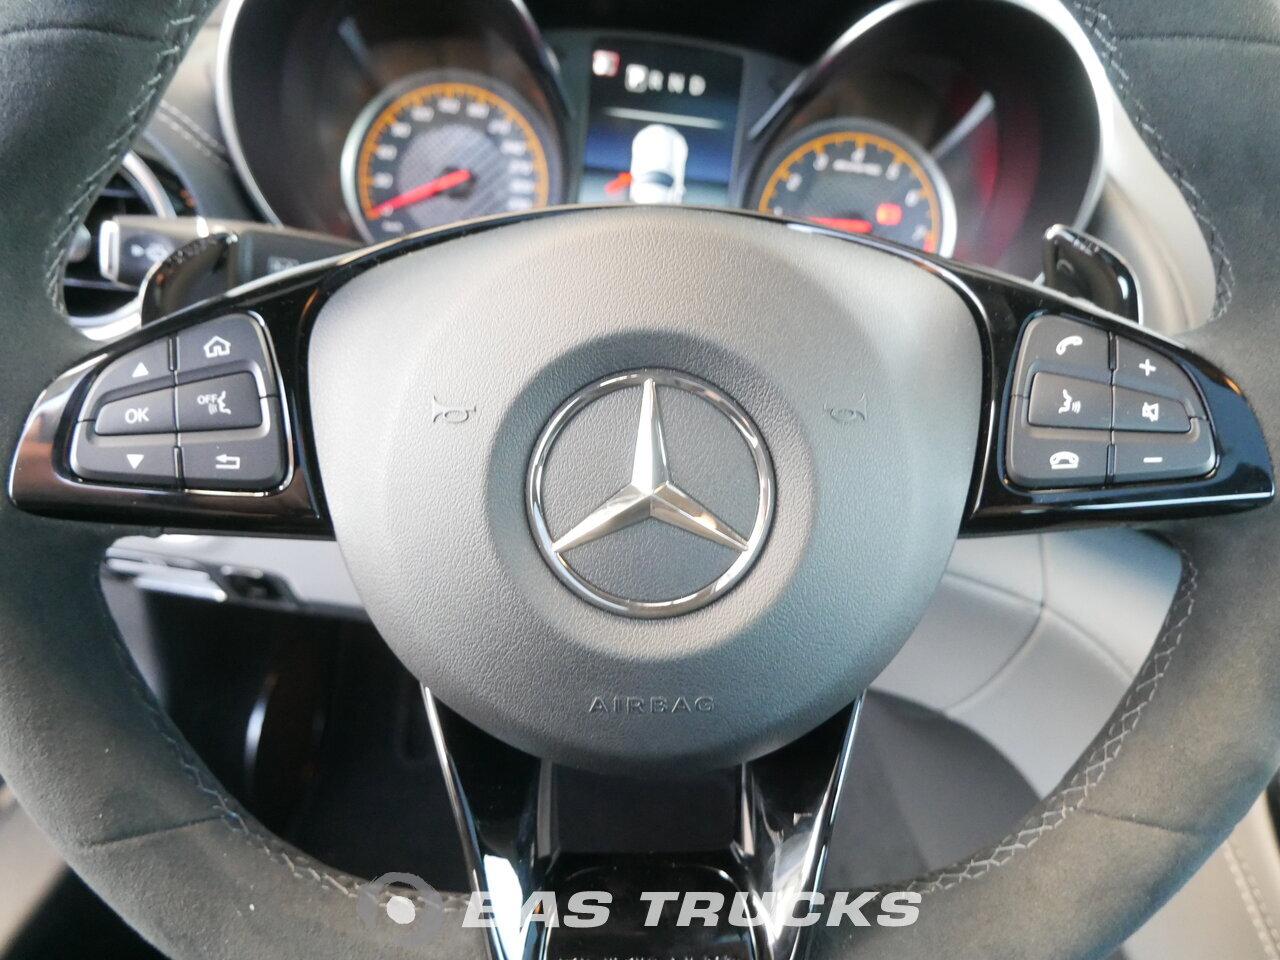 foto de Usado Coche Mercedes AMG GTC Coupe Edition 50 2018